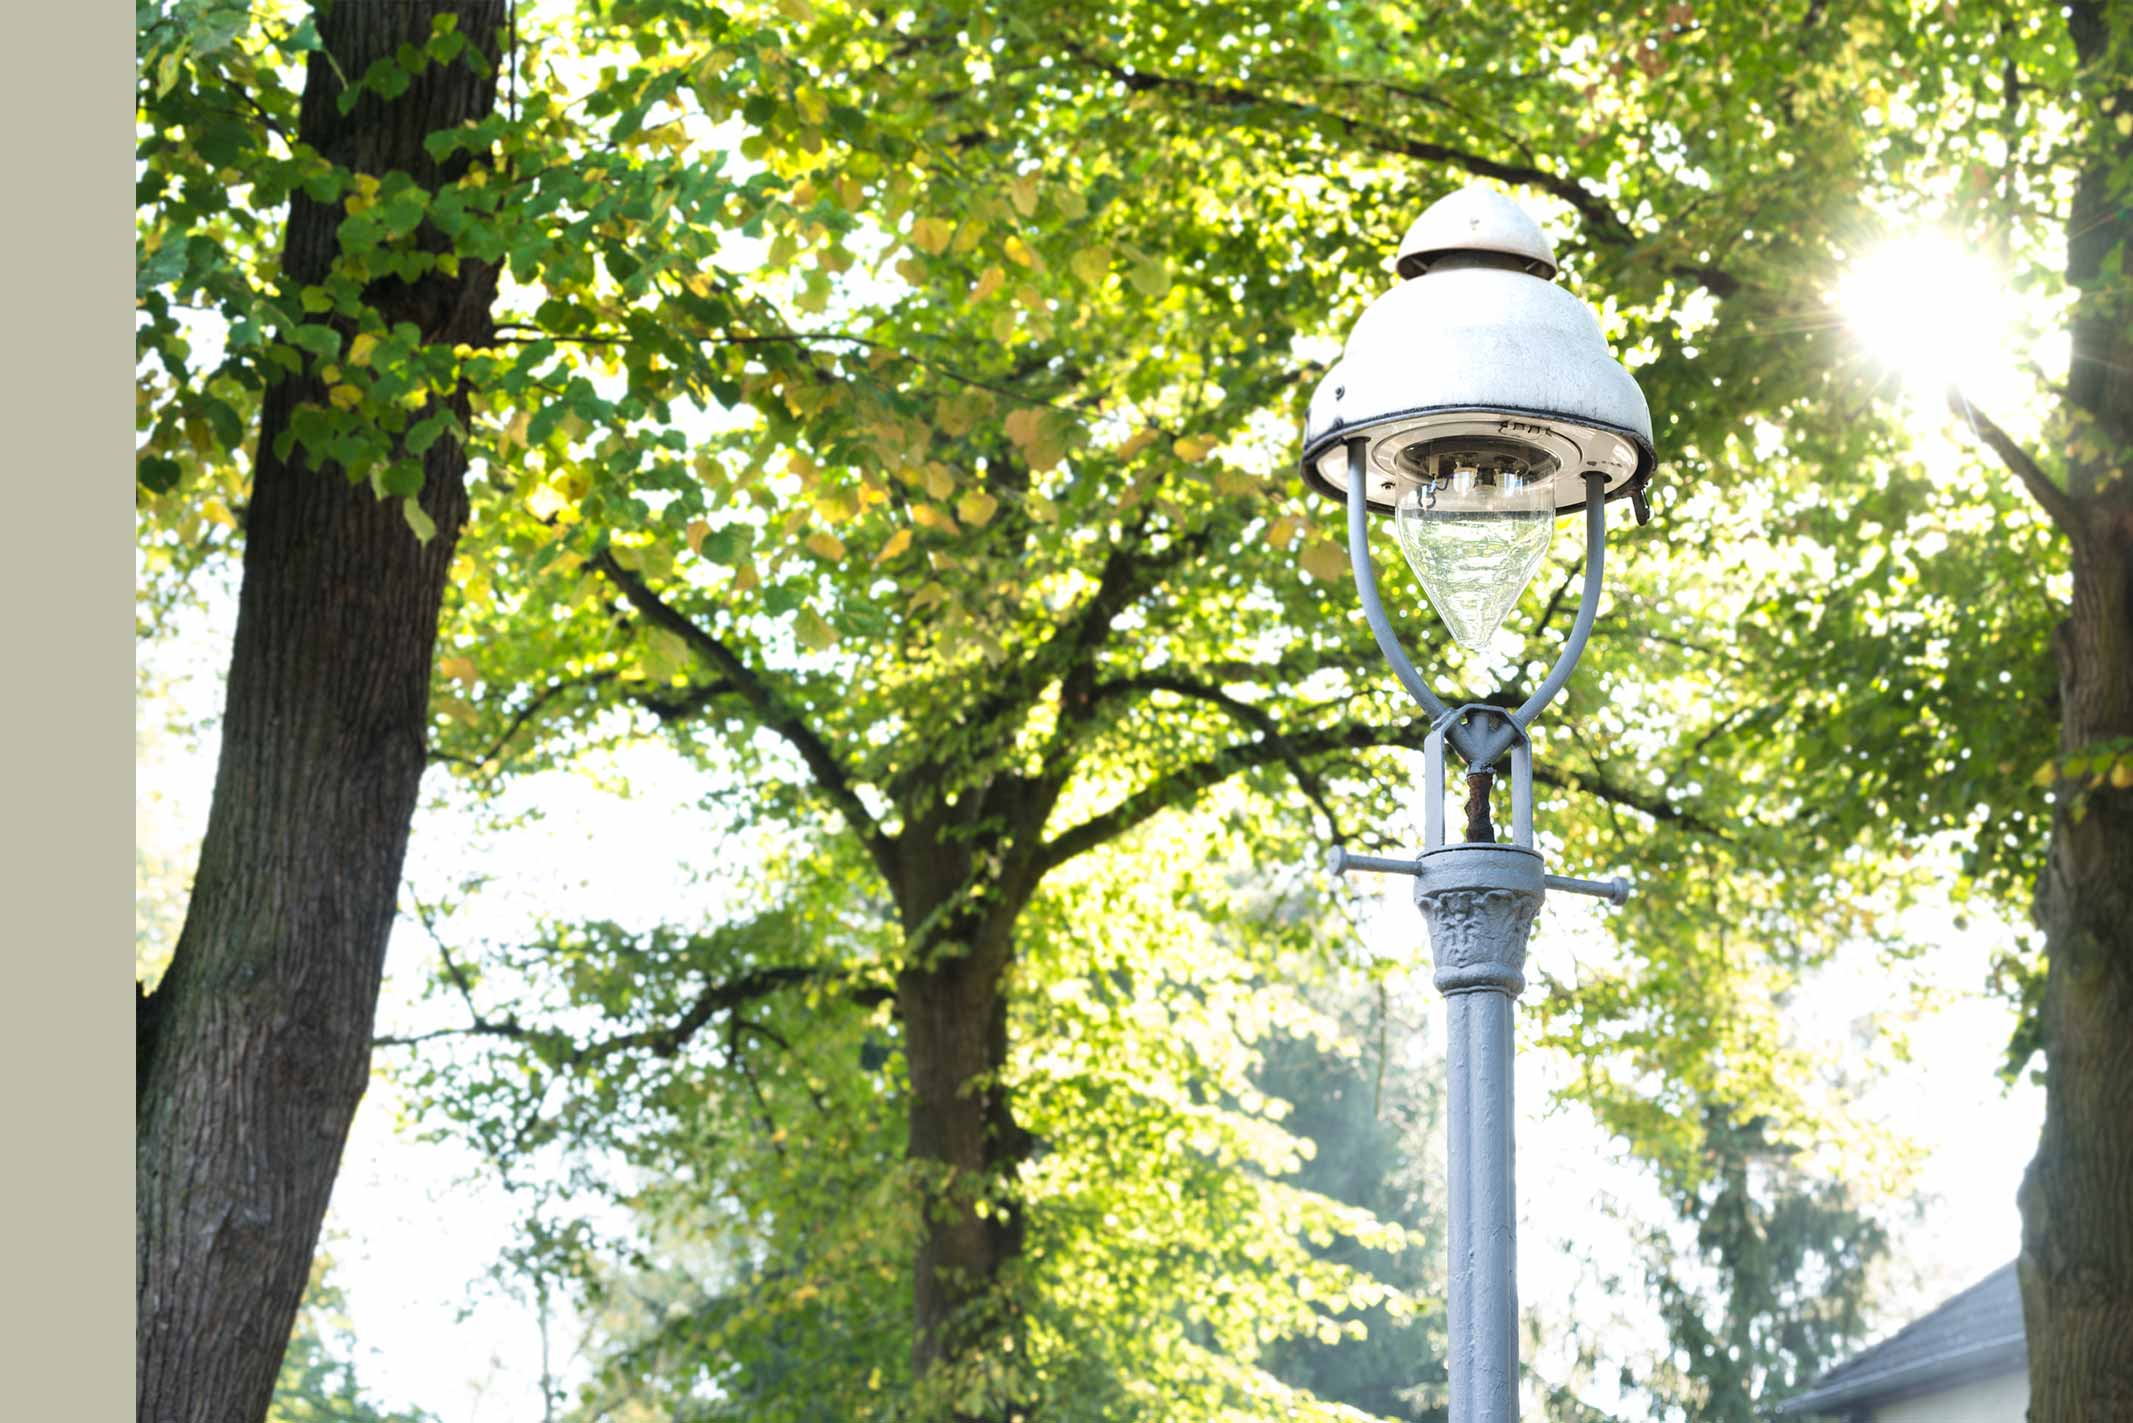 schweizer park berlin lichterfelde west berner stra e 9 project immobilien berlin. Black Bedroom Furniture Sets. Home Design Ideas